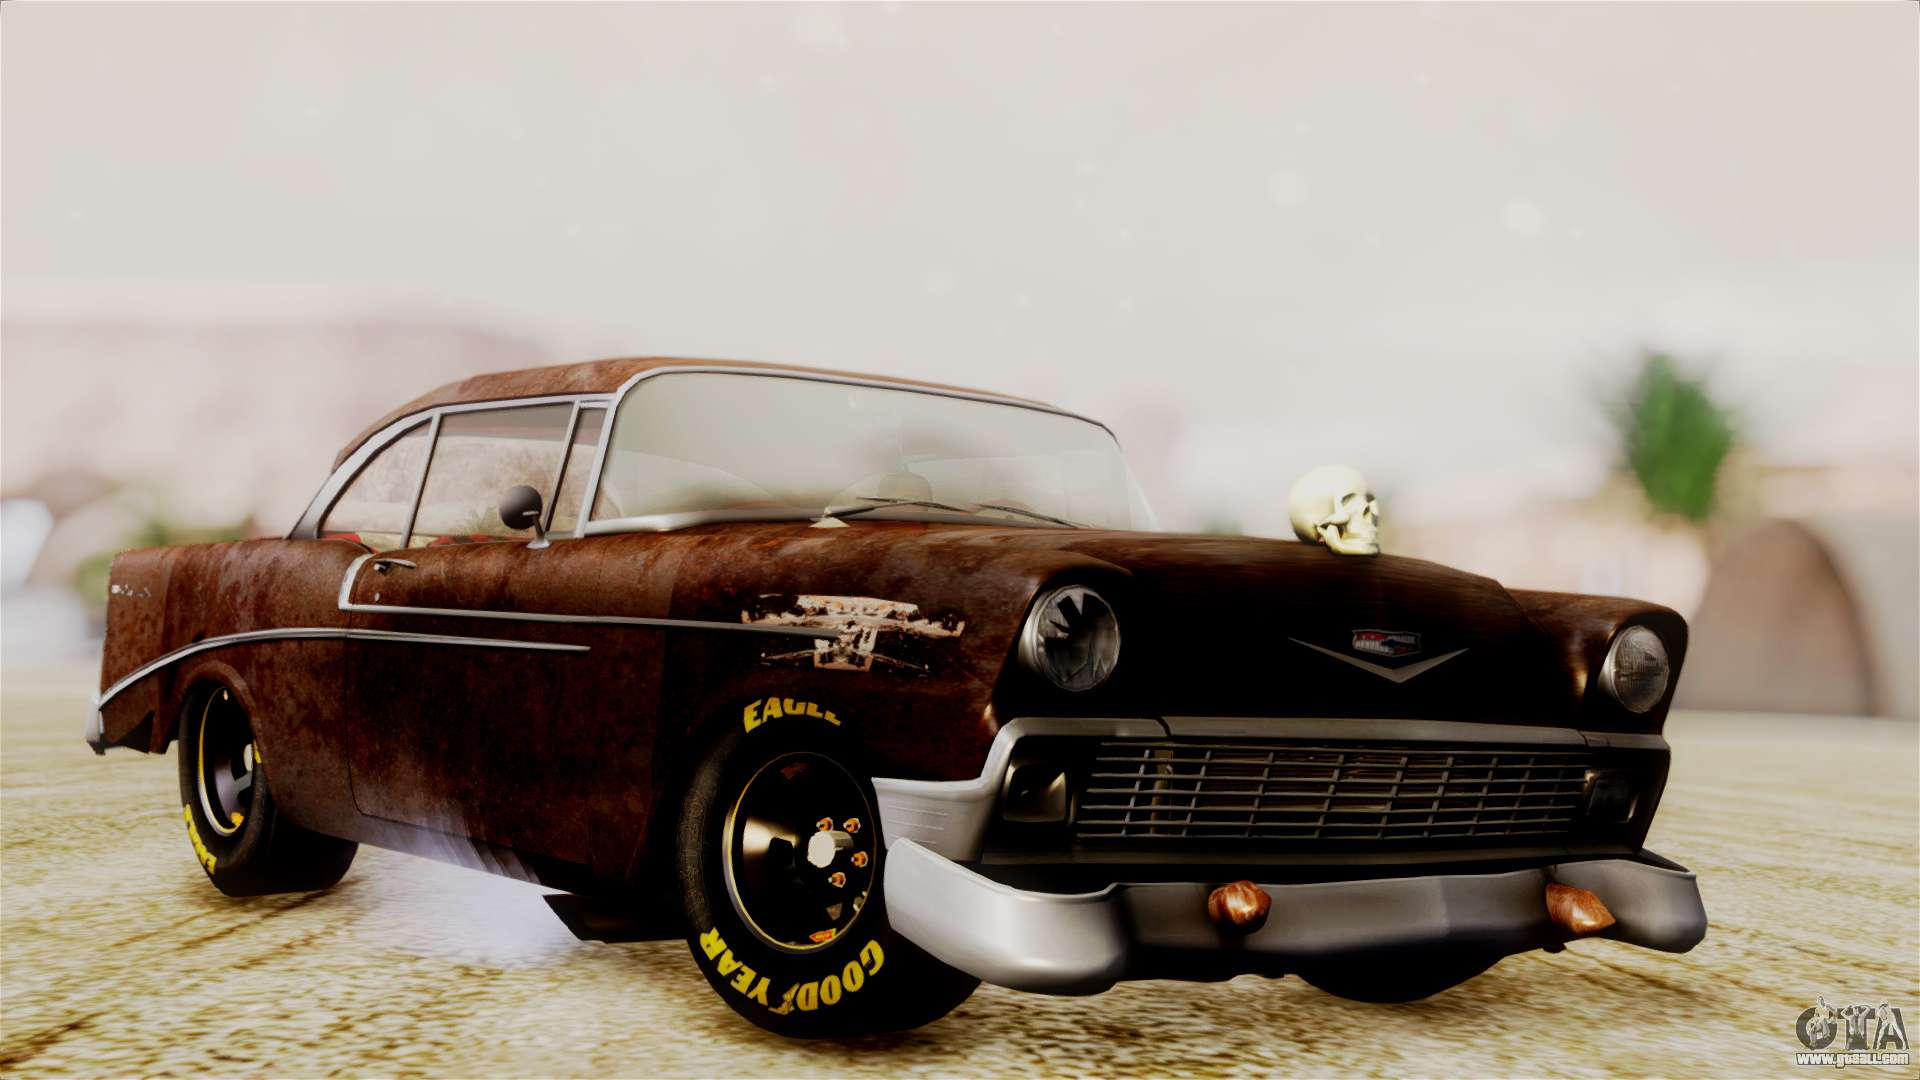 1956 chevrolet bel air images photo 56 chevy belair dv 06 - Chevrolet Bel Air 1956 Rat Rod Street